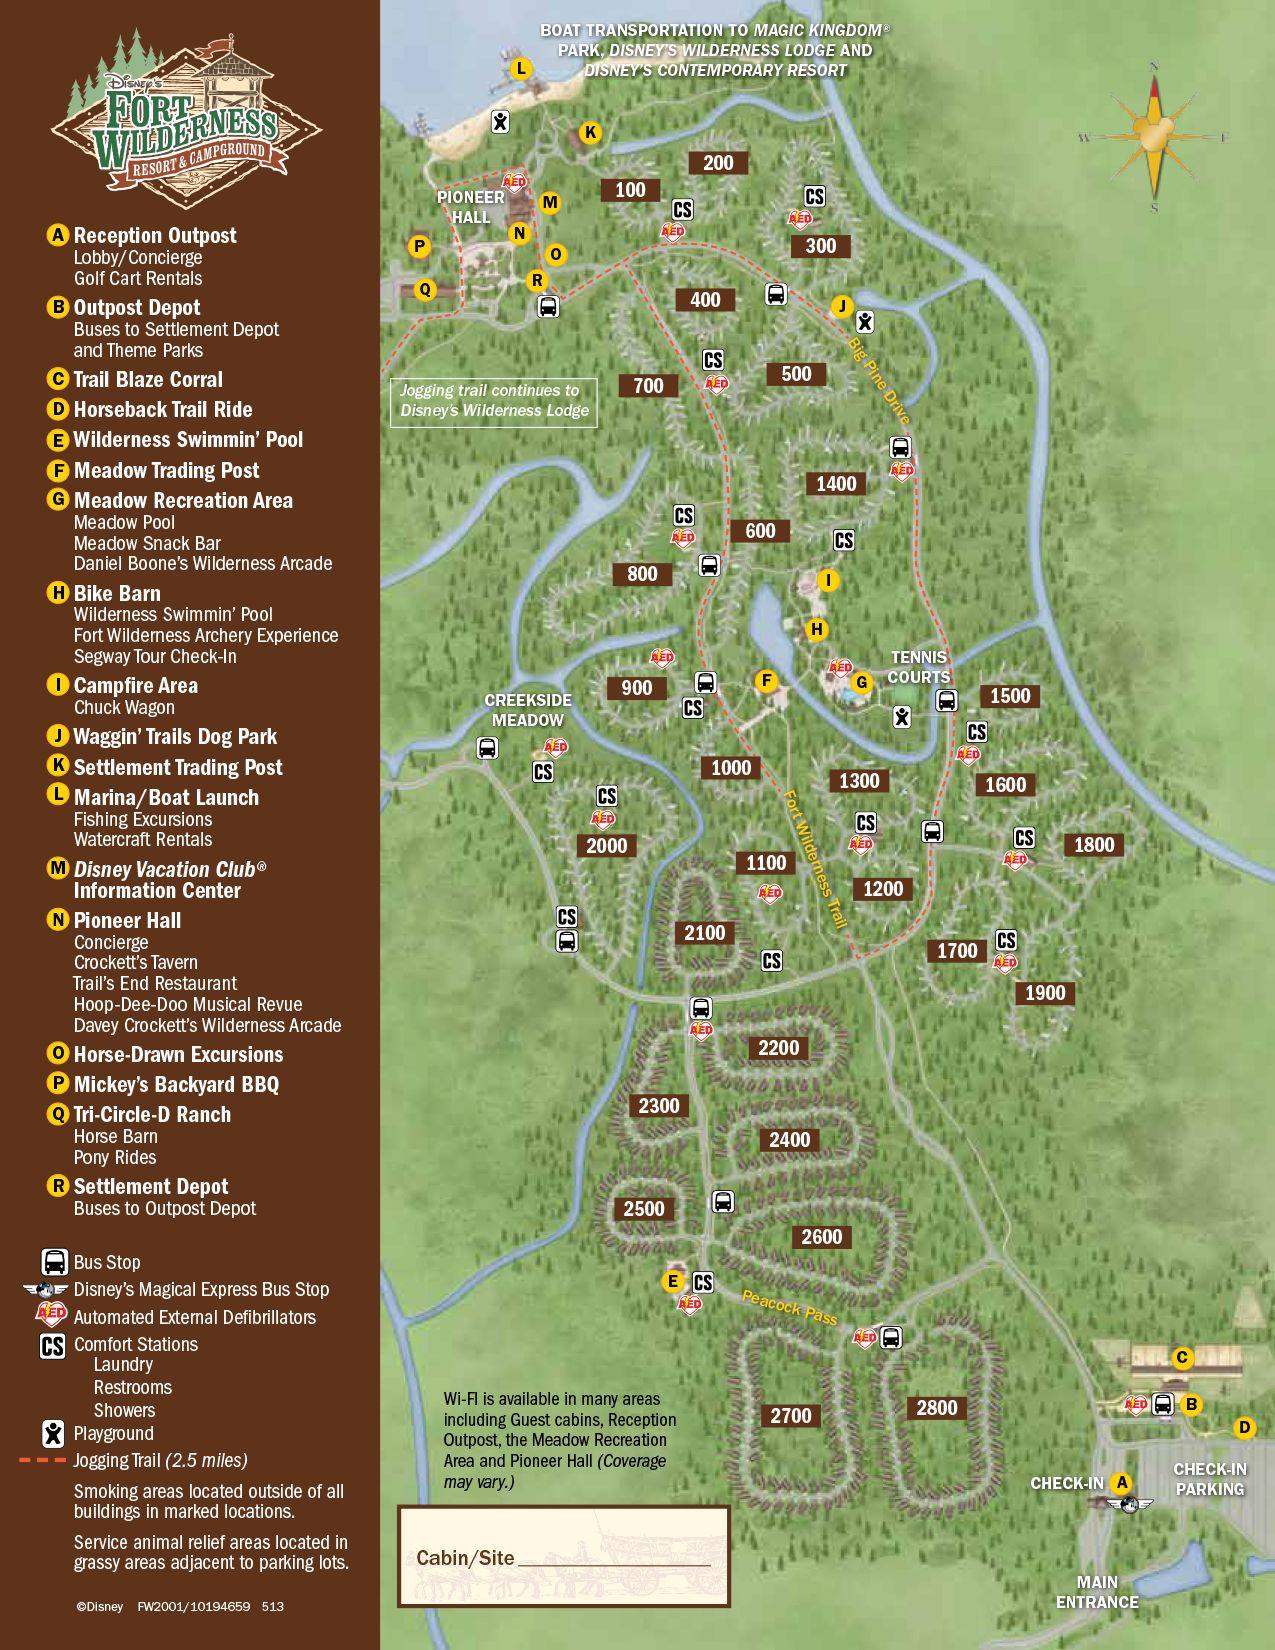 Fort Wilderness Resort Map | Disney World Maps | Pinterest | Fort ...